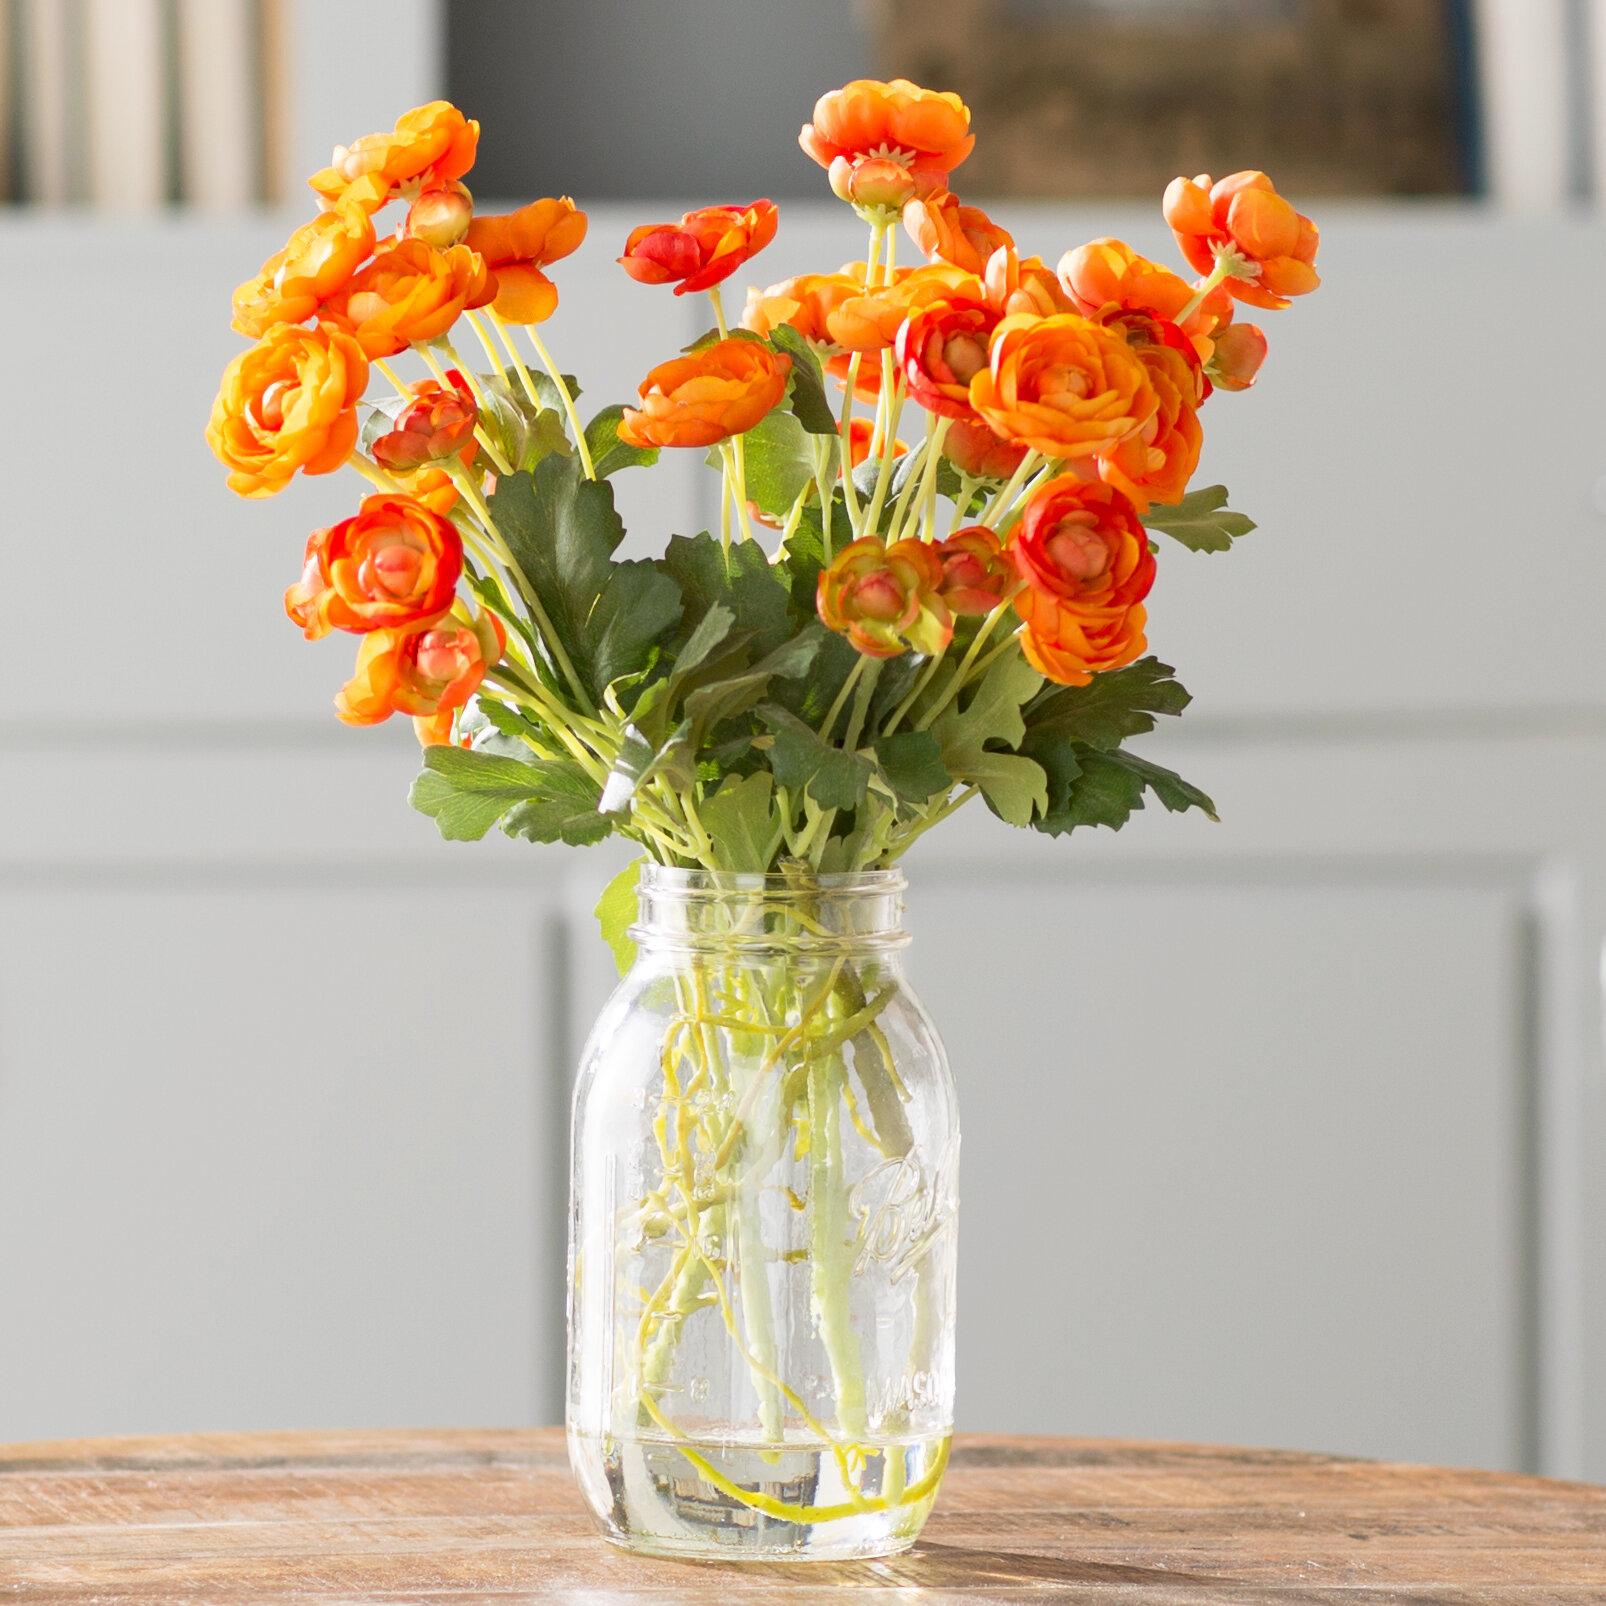 Ranunculus Flower Arrangements You Ll Love In 2021 Wayfair Ca